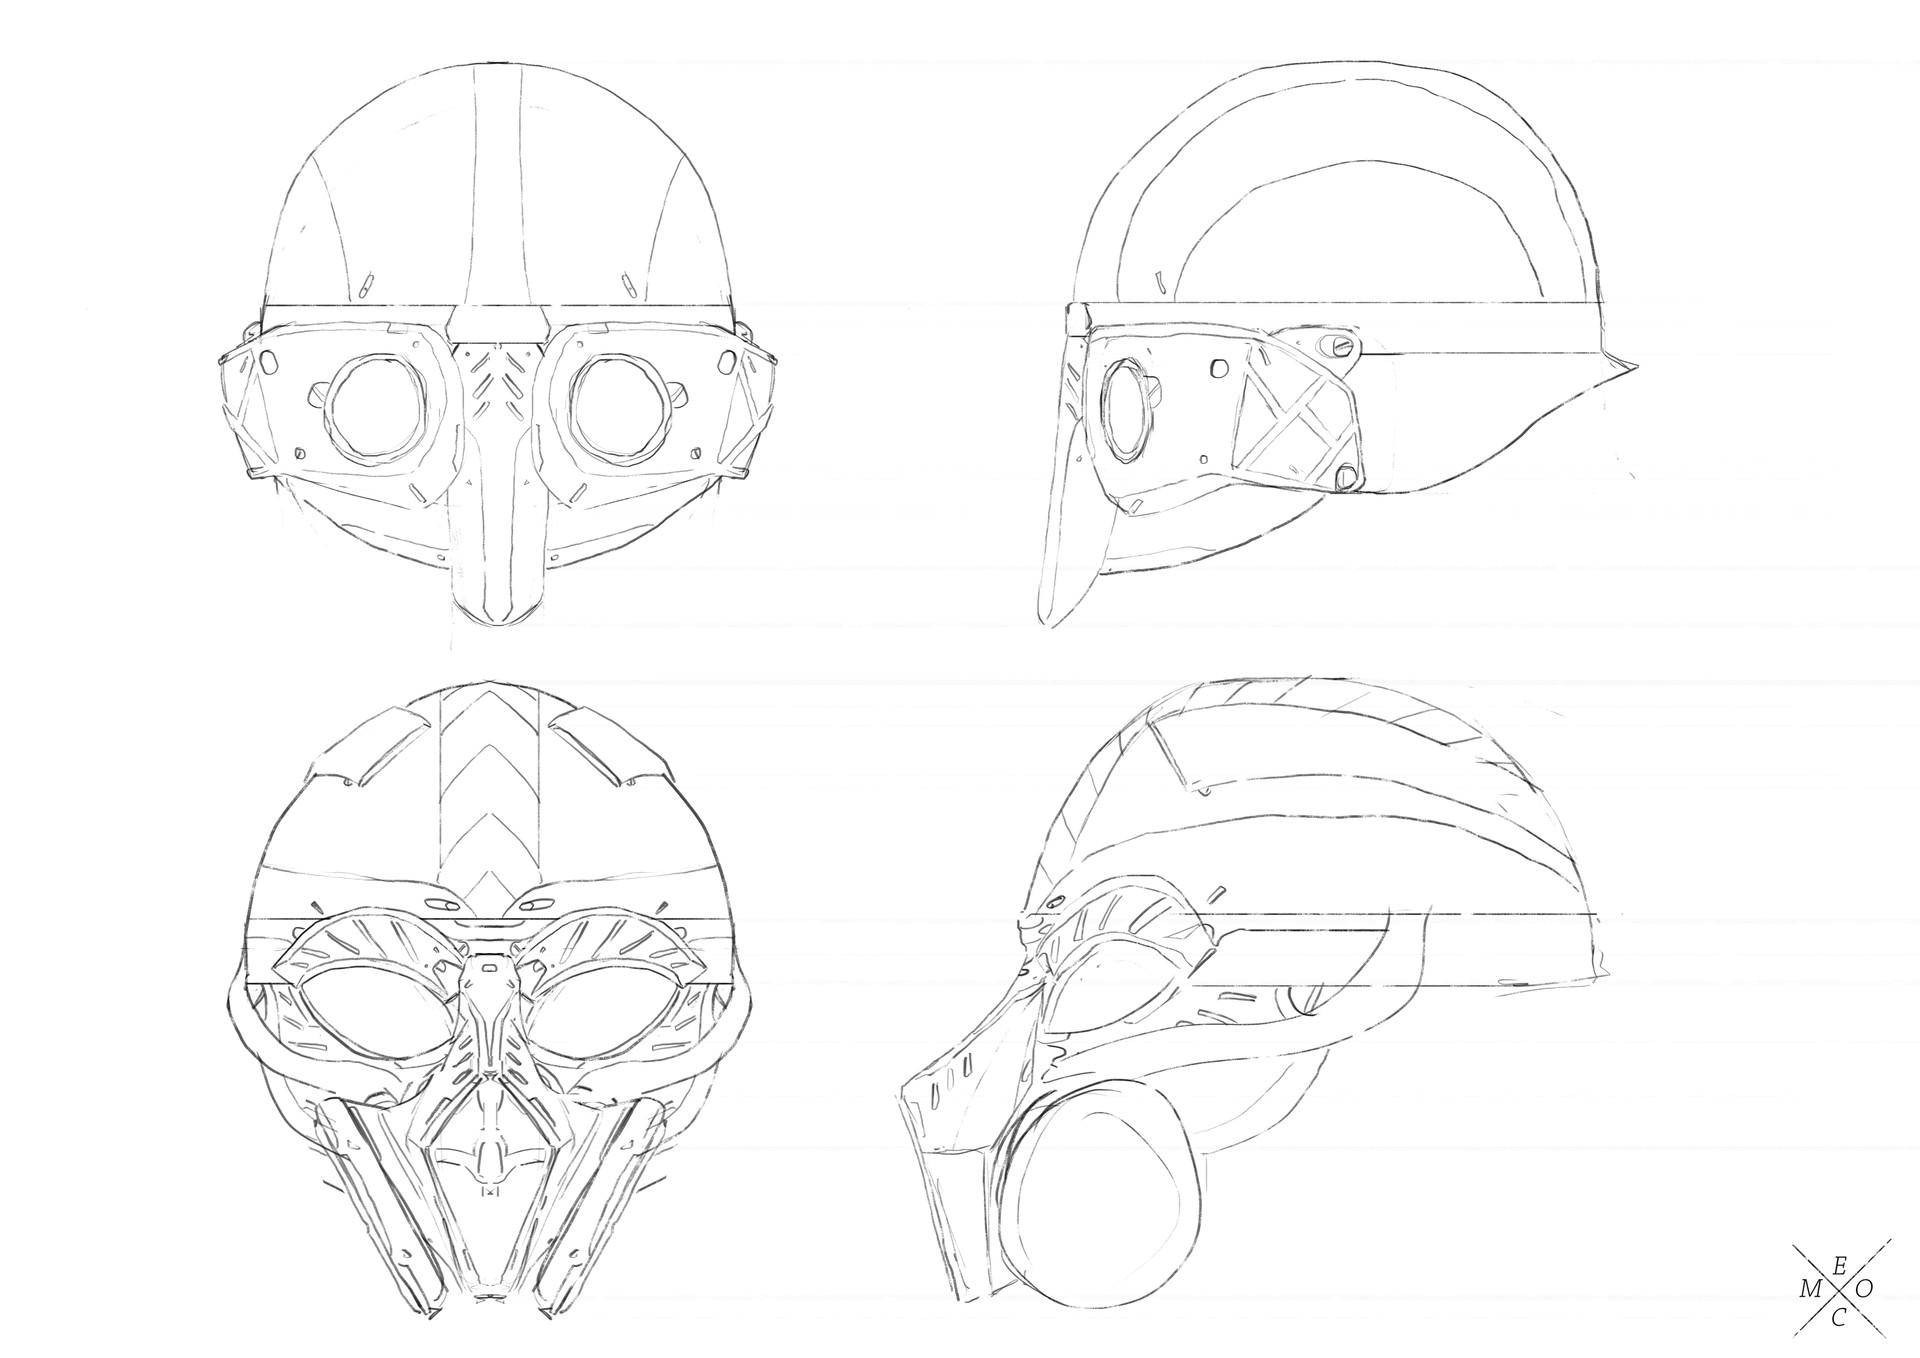 Erlend capodanno helment design03